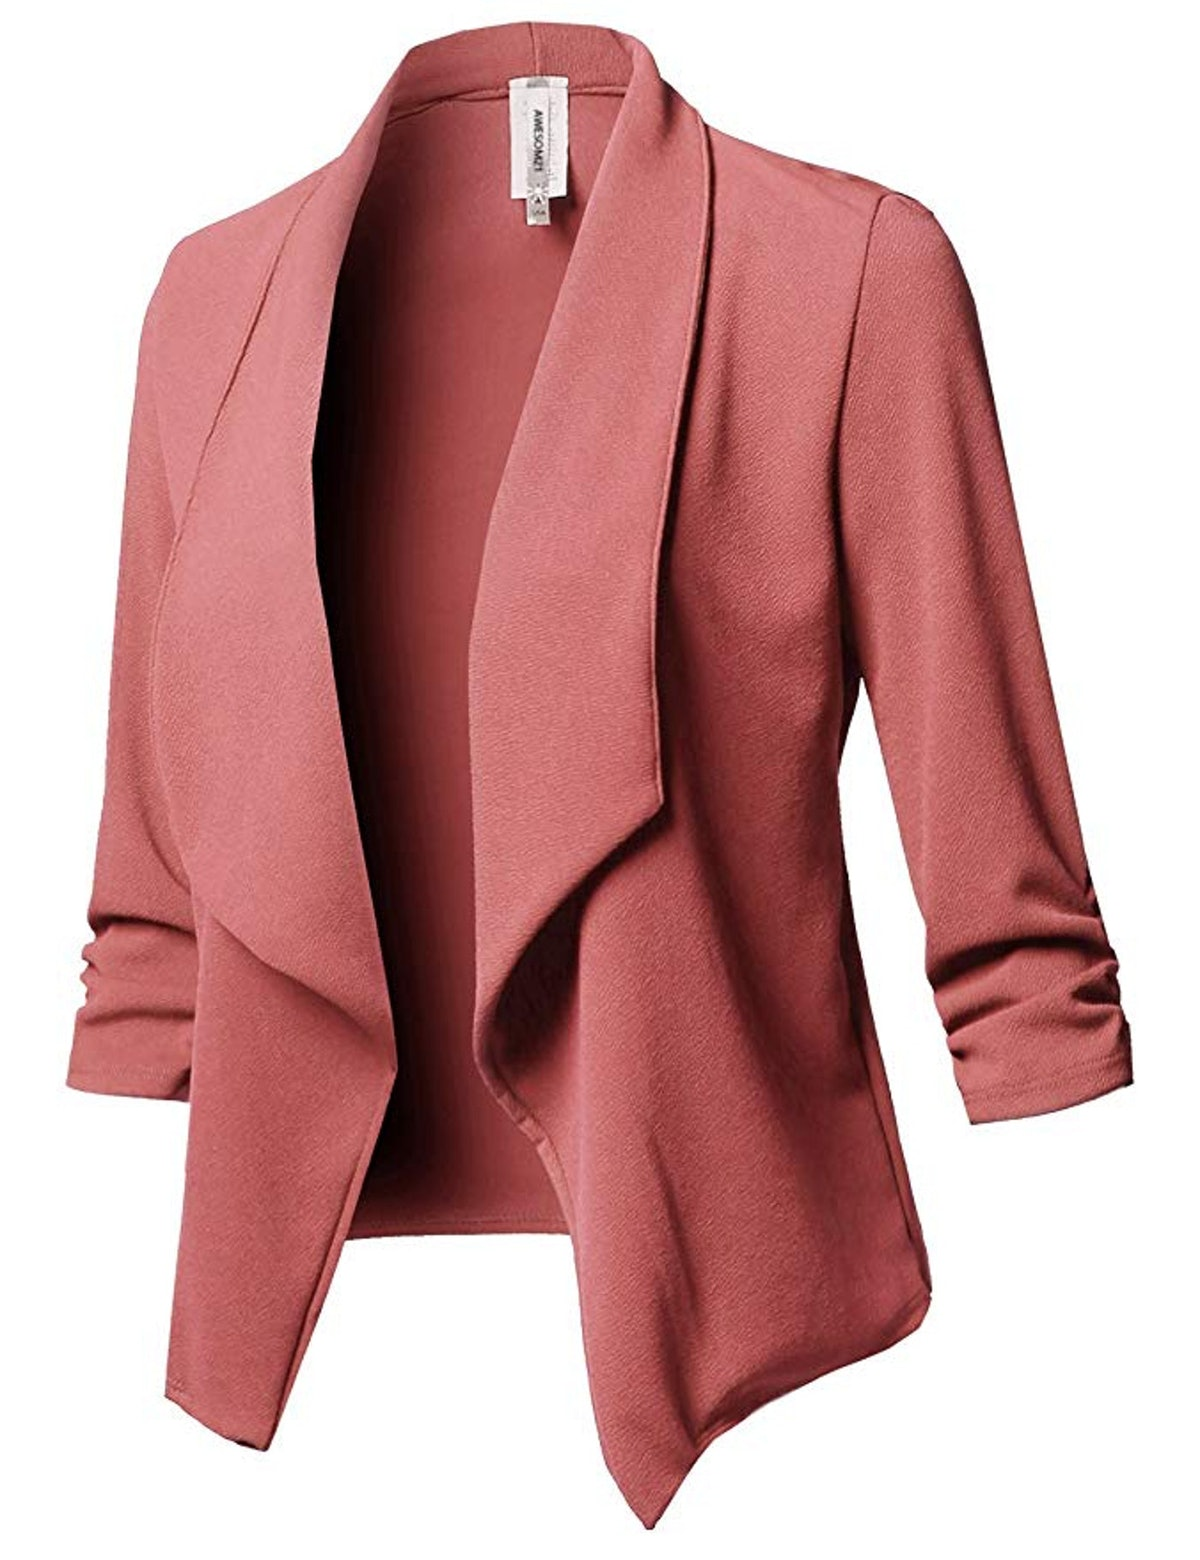 Awesome21 Women's Stretch Gathered Sleeve Open Blazer Jacket